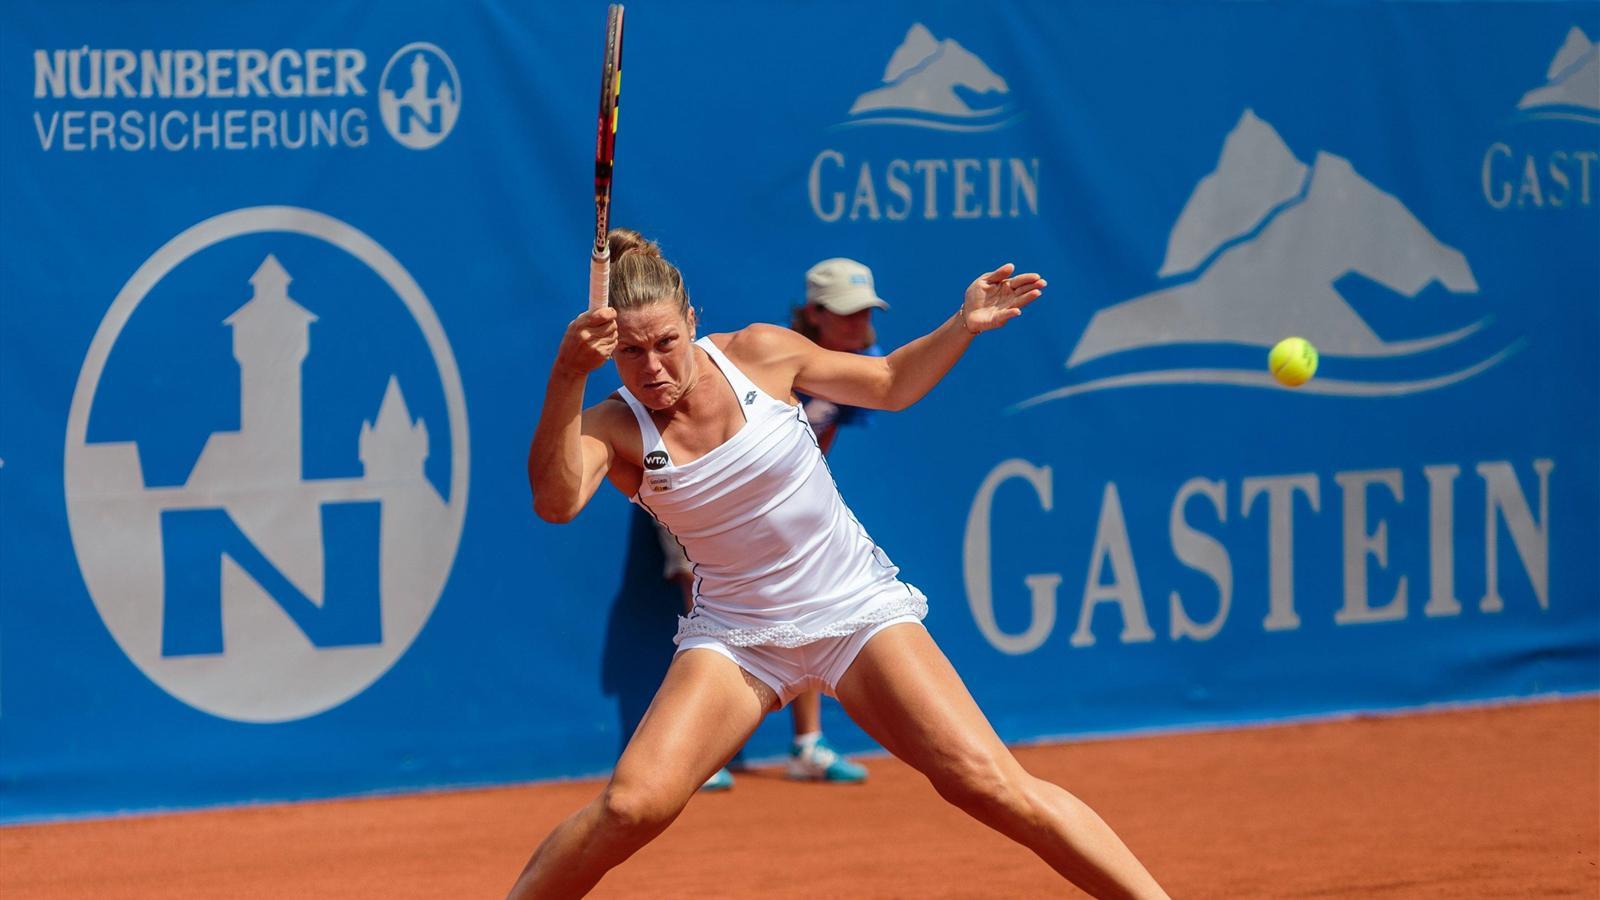 us open bracket 2015 tennis ga mls pro